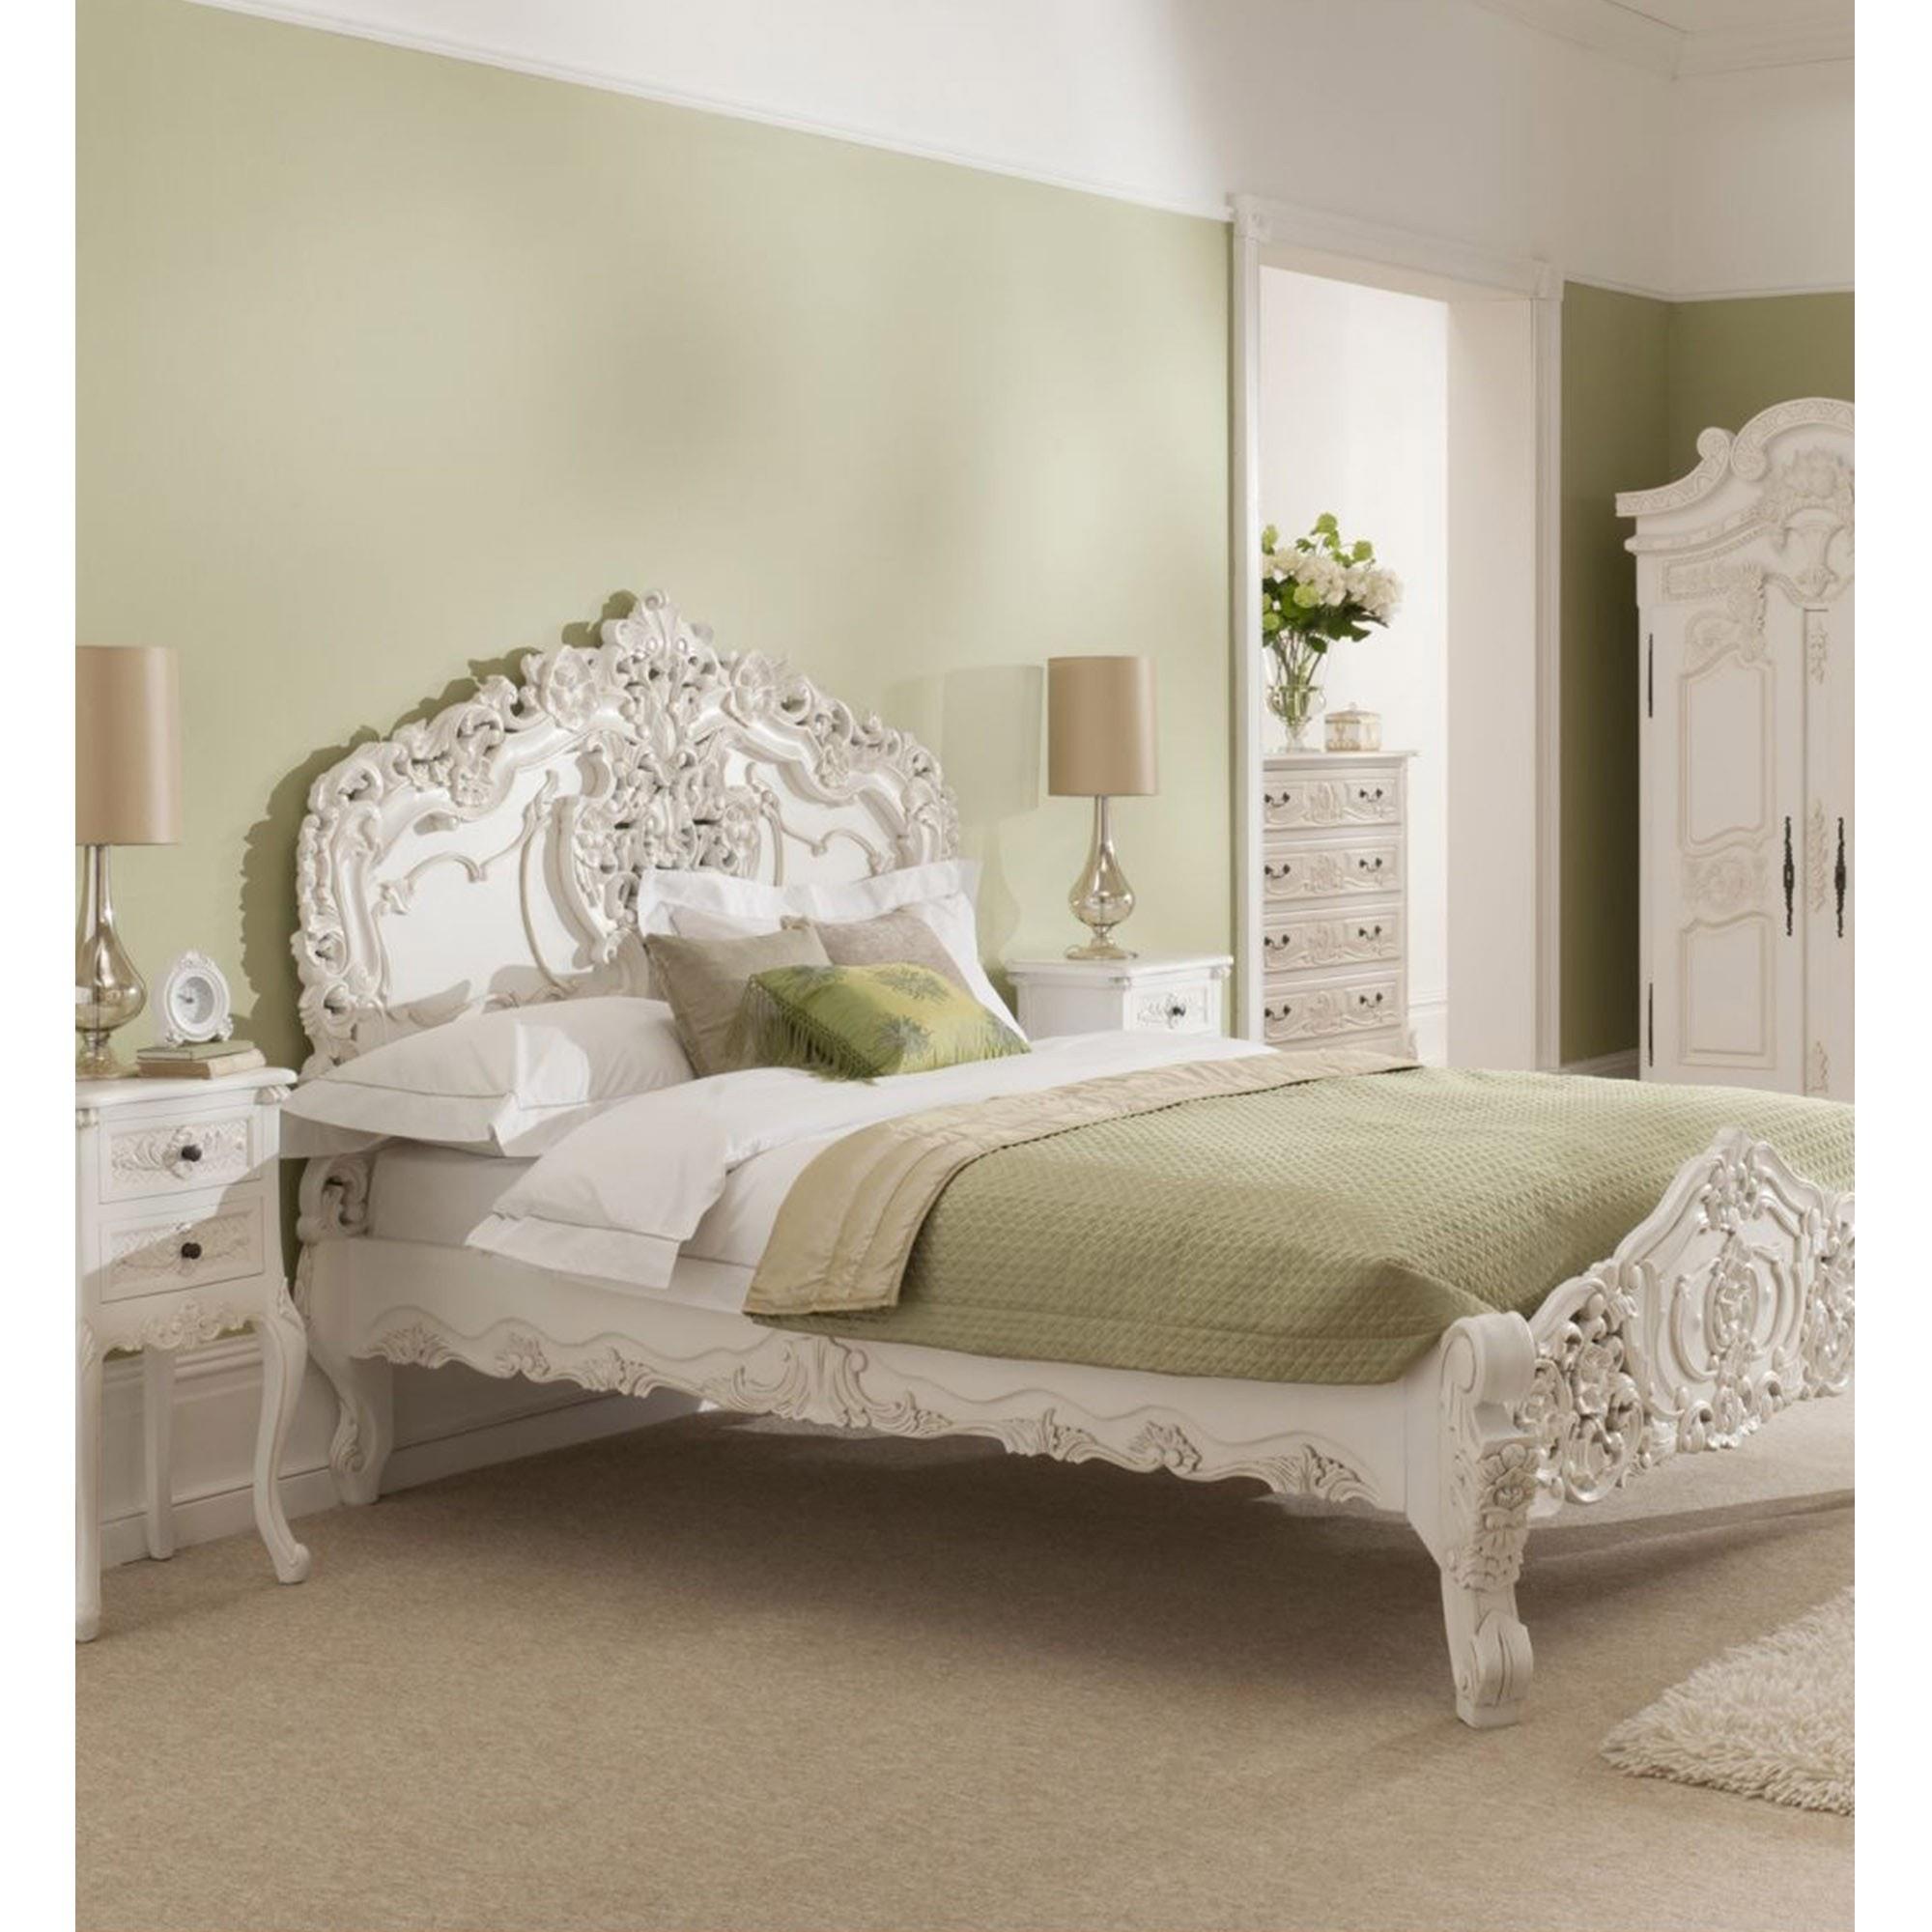 Terrific Rococo Bedroom Furniture Set Best Image Libraries Thycampuscom